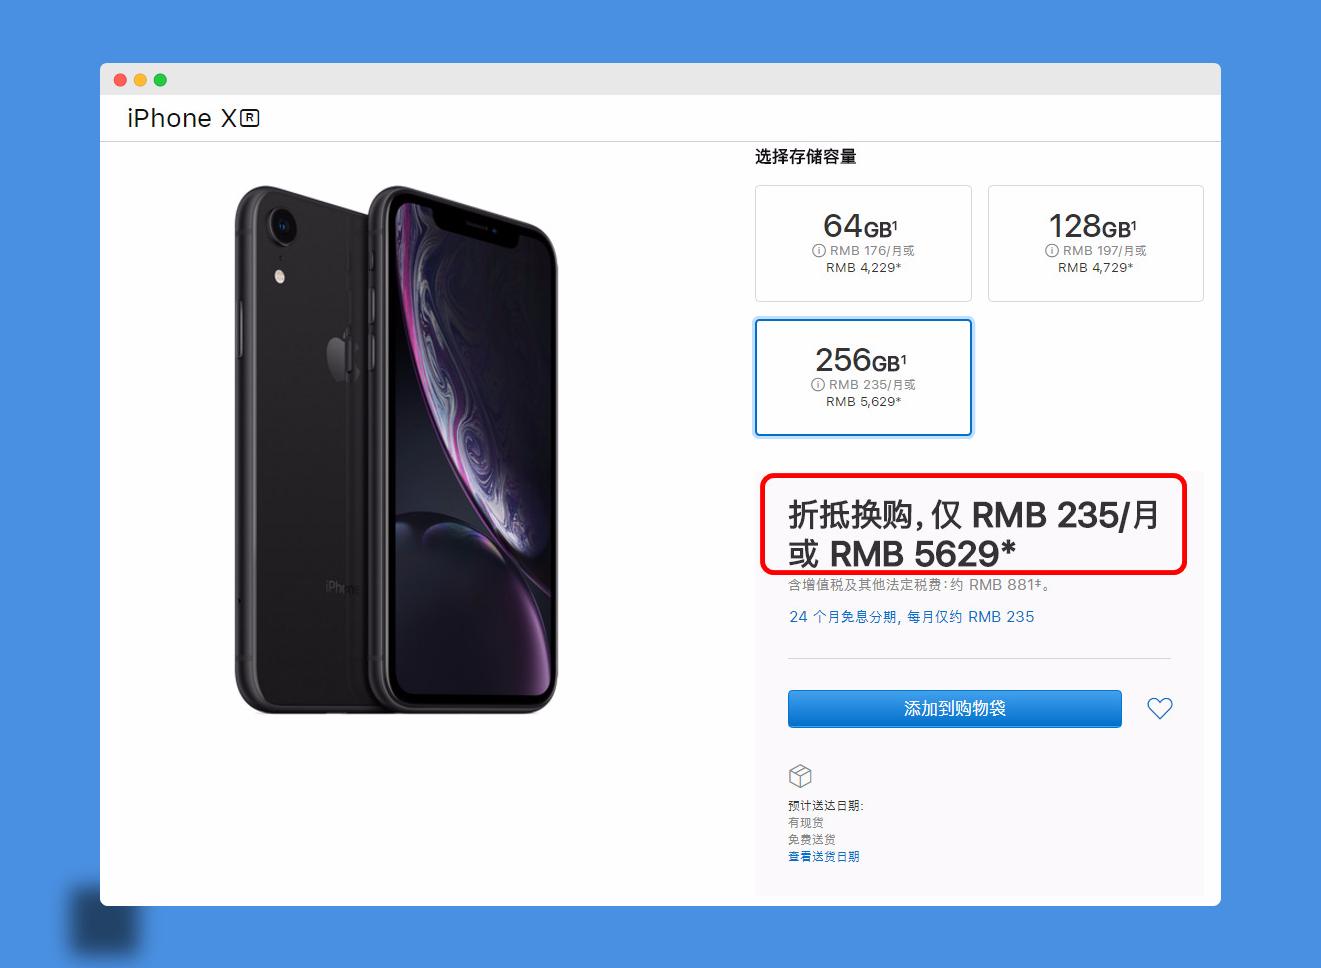 iPhone XR/XS 官方折扣活动即将结束,如何加入换购计划?